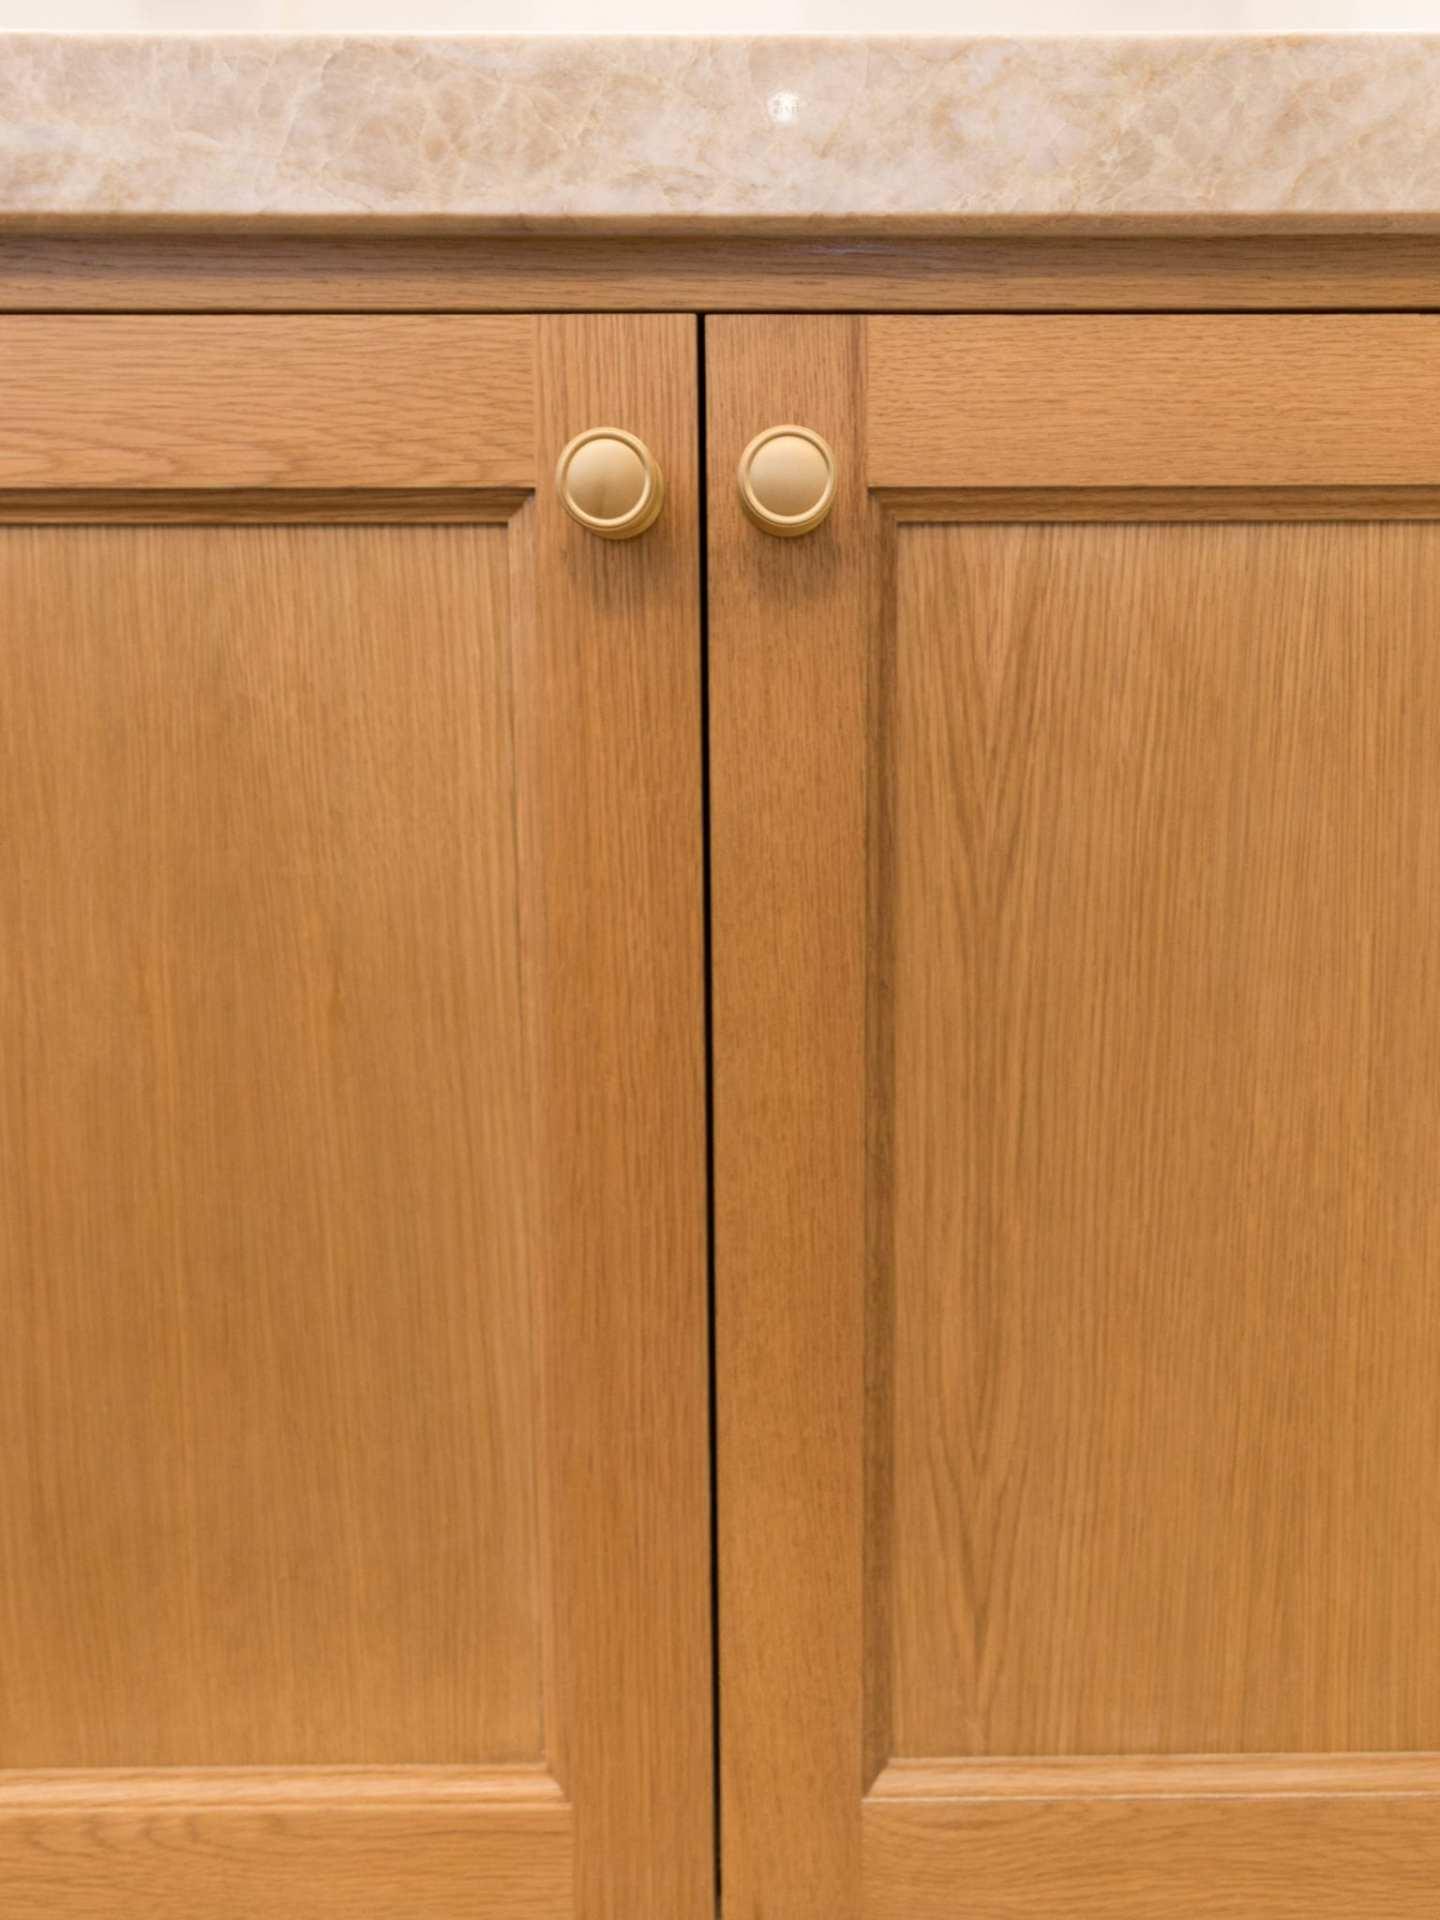 VESTA hardware Knobs on oak kitchen cabinets.